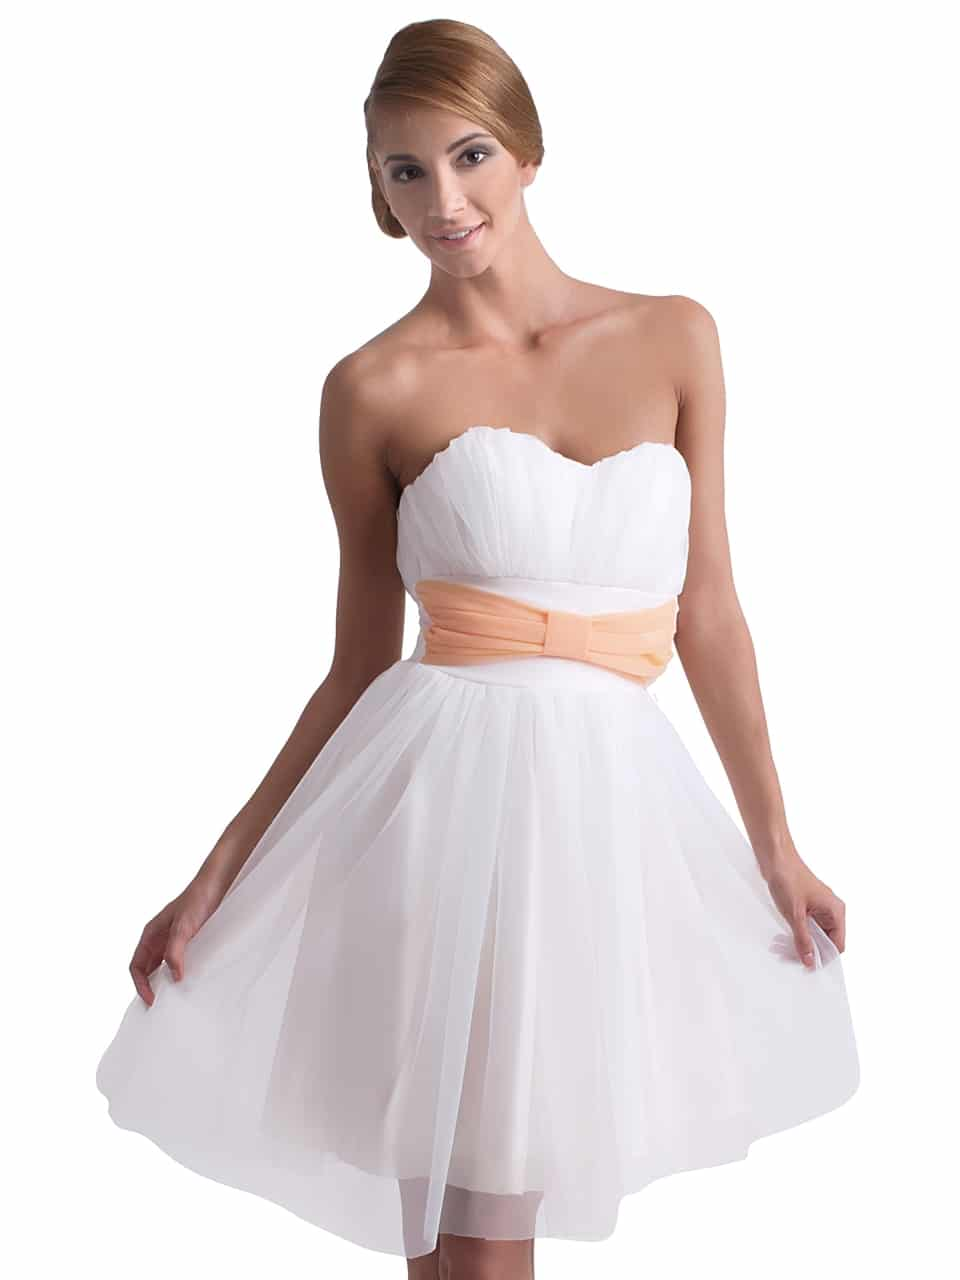 en-trend-beyaz-elbise-modelleri-31